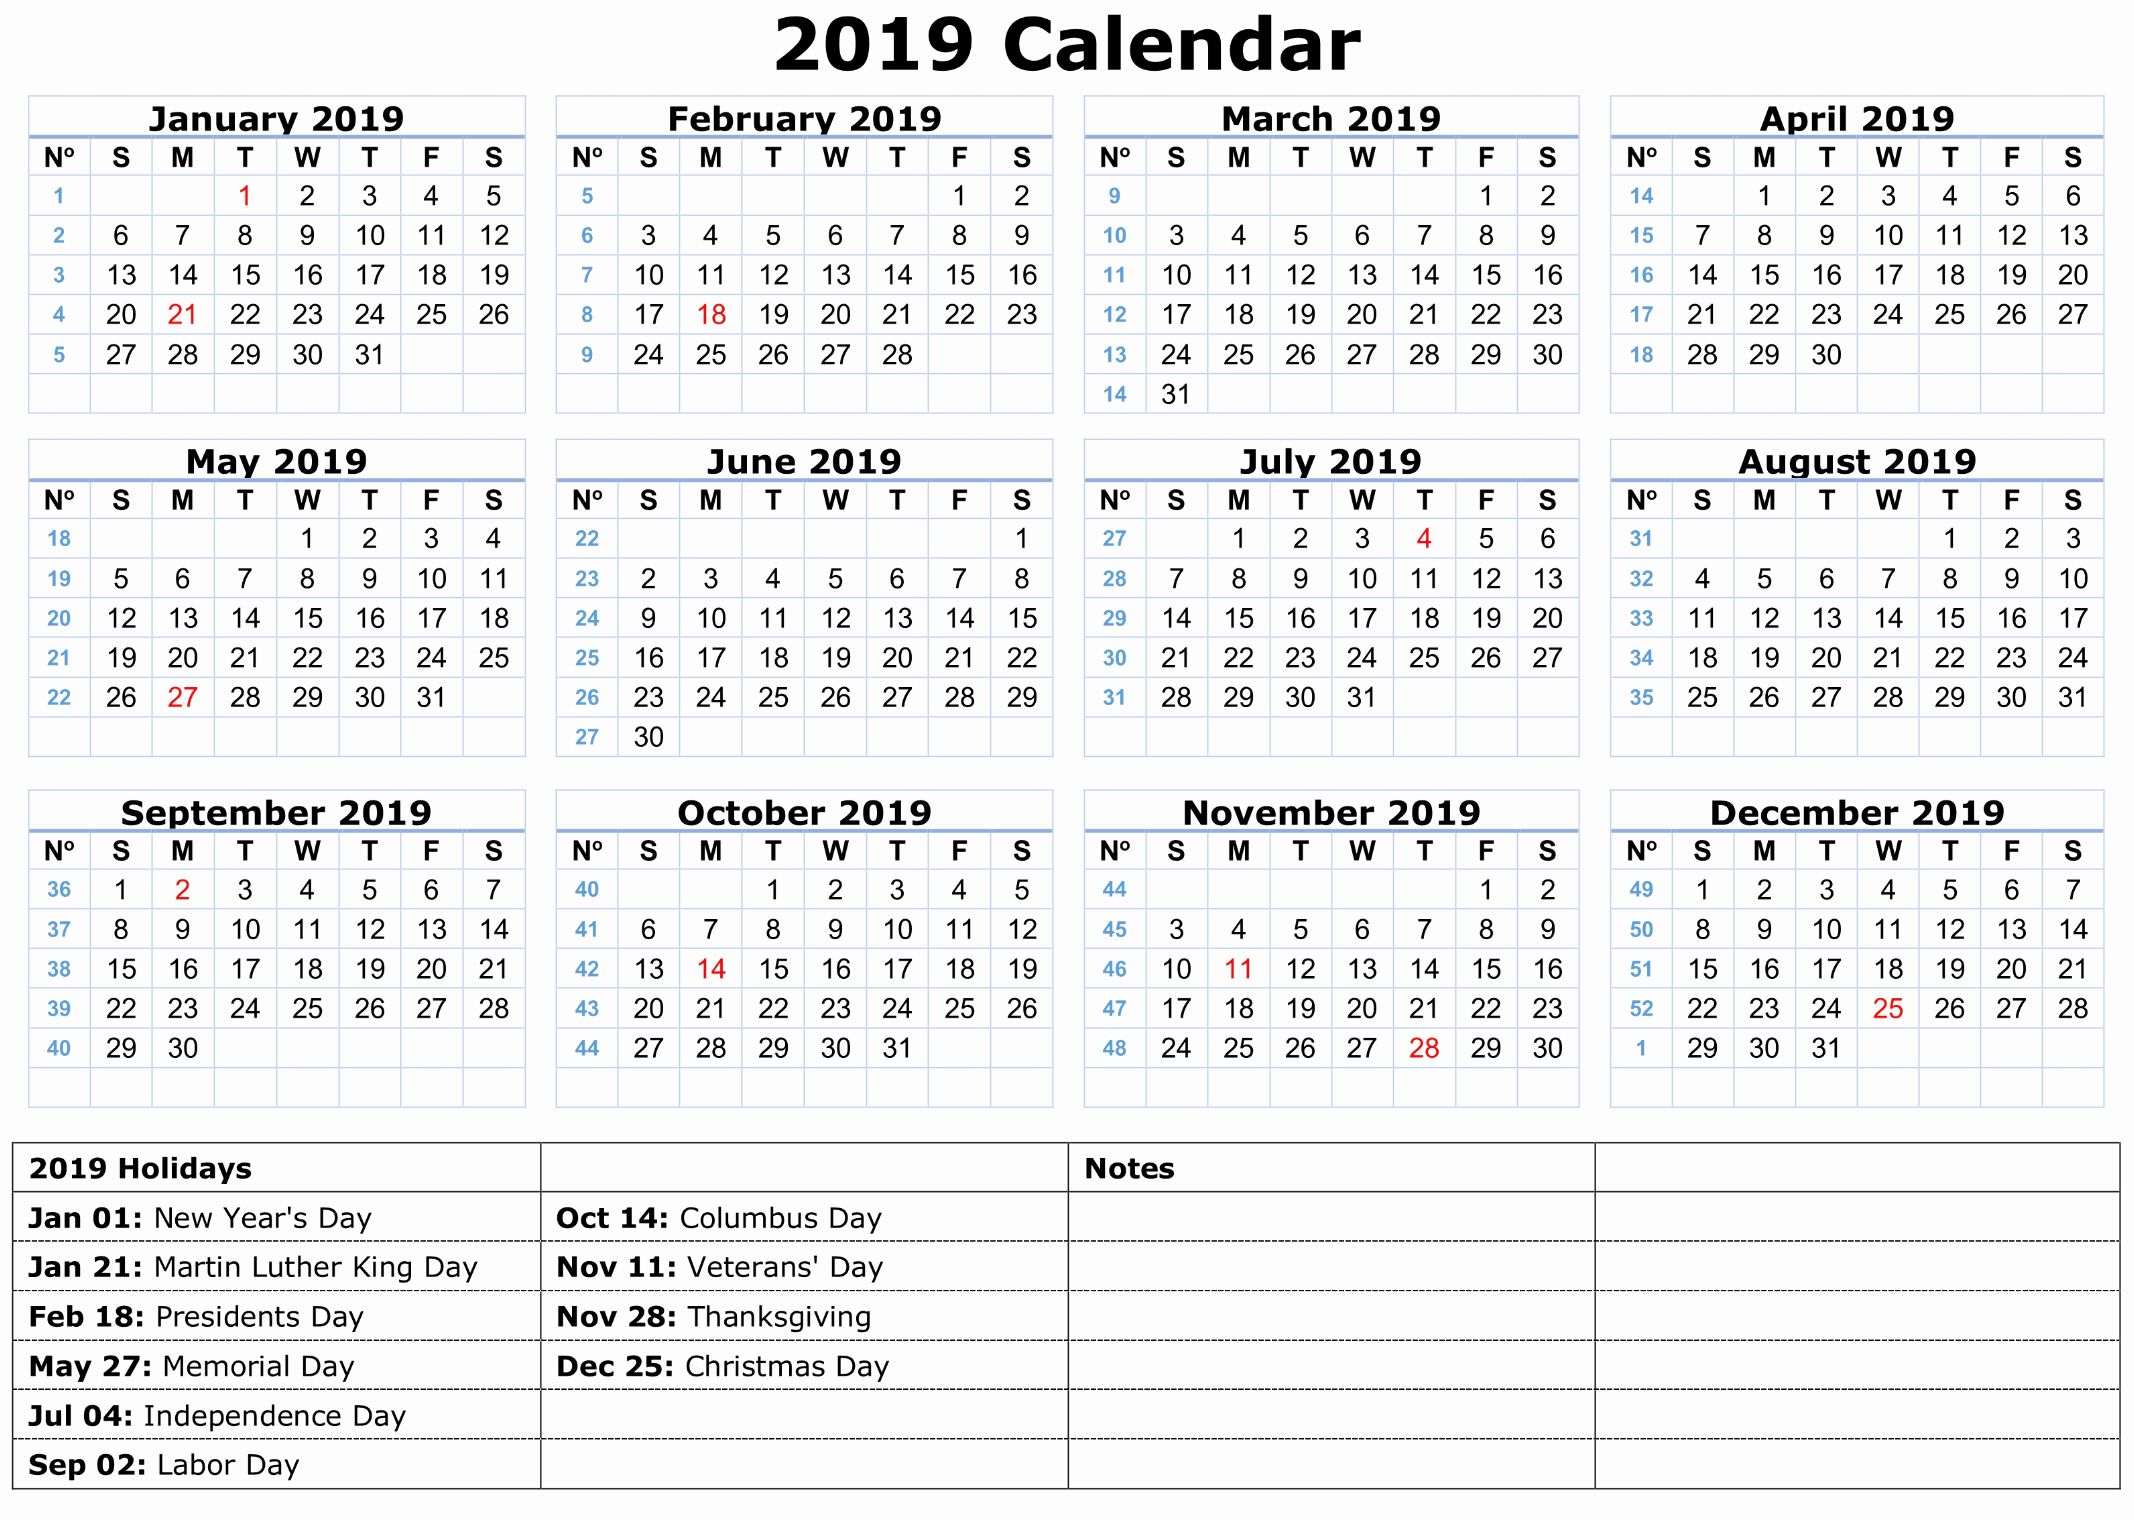 Free Printable Calendar Templates 2019 New 2019 Calendar Amazonaws